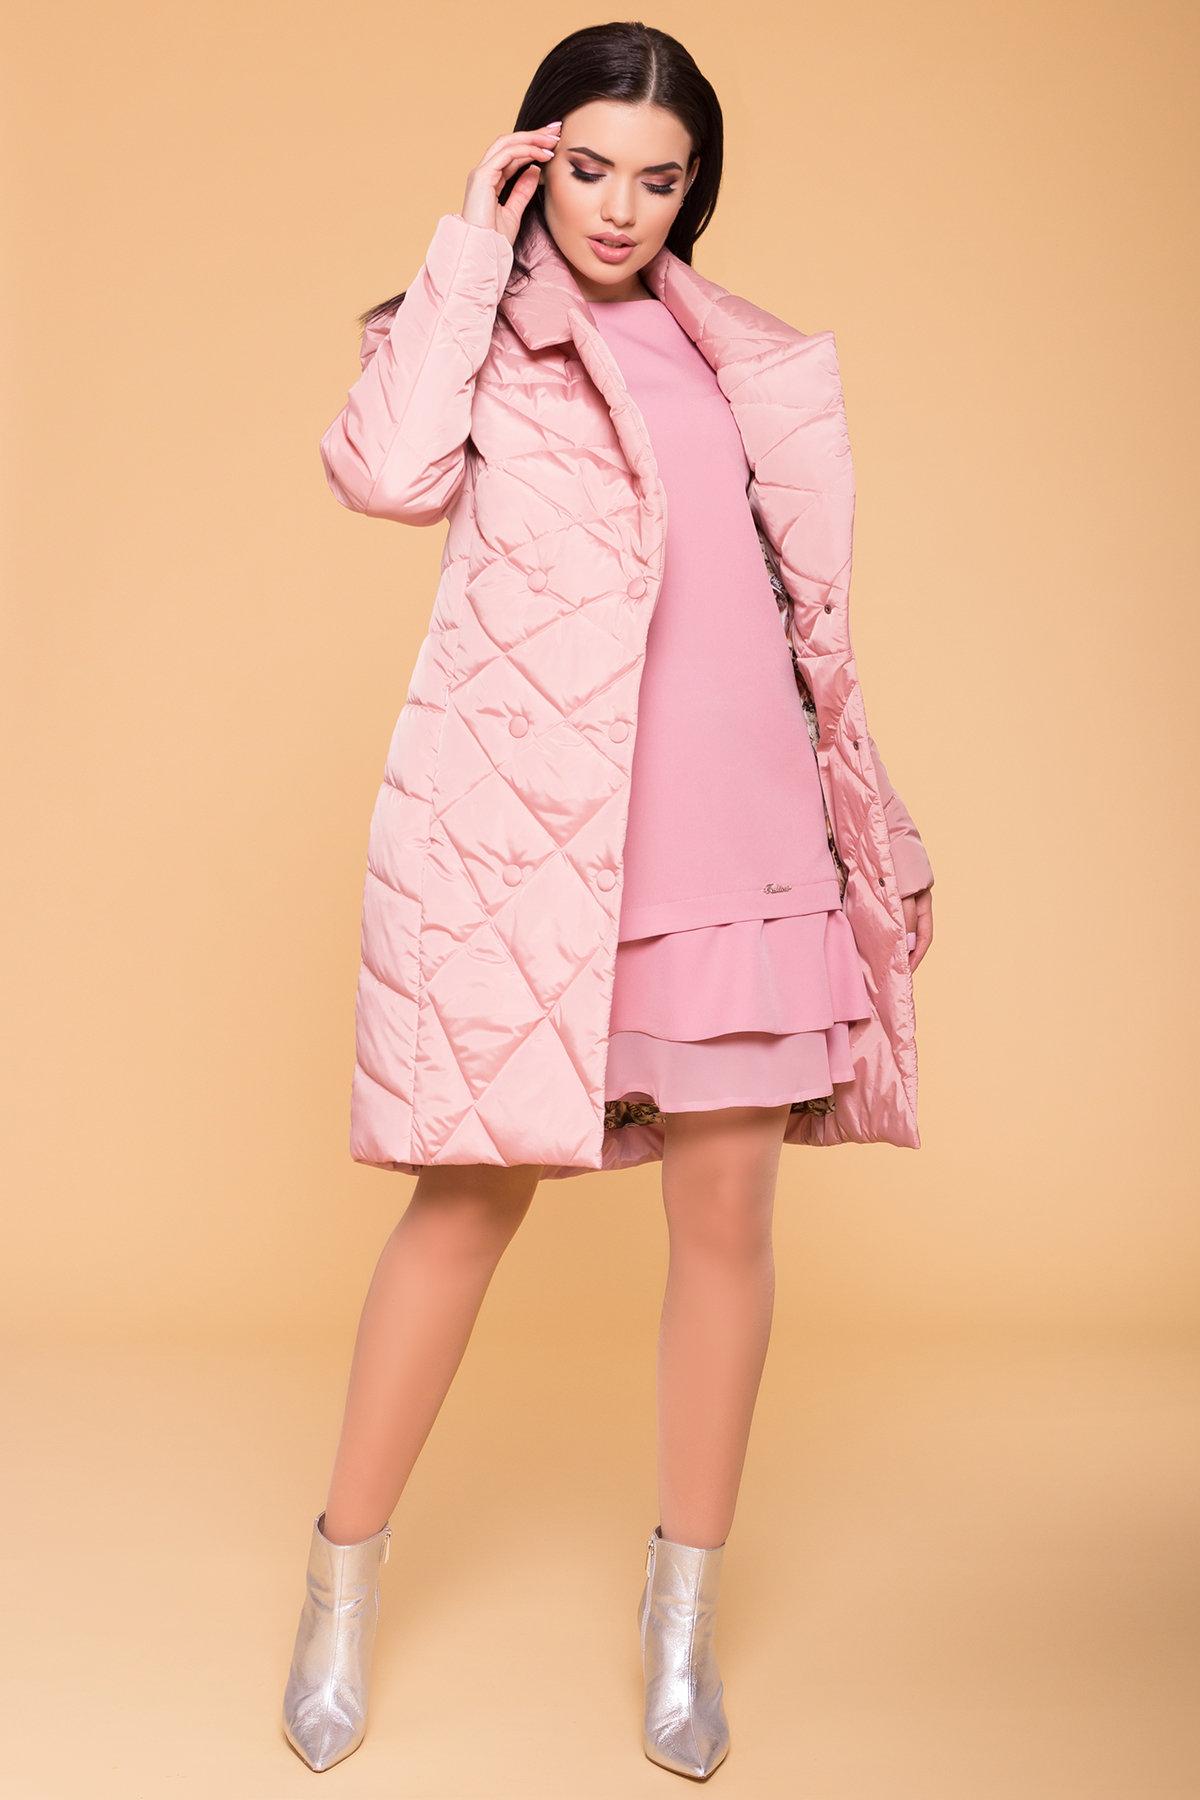 Пальто Сандра 6422 АРТ. 41356 Цвет: Пудра - фото 3, интернет магазин tm-modus.ru